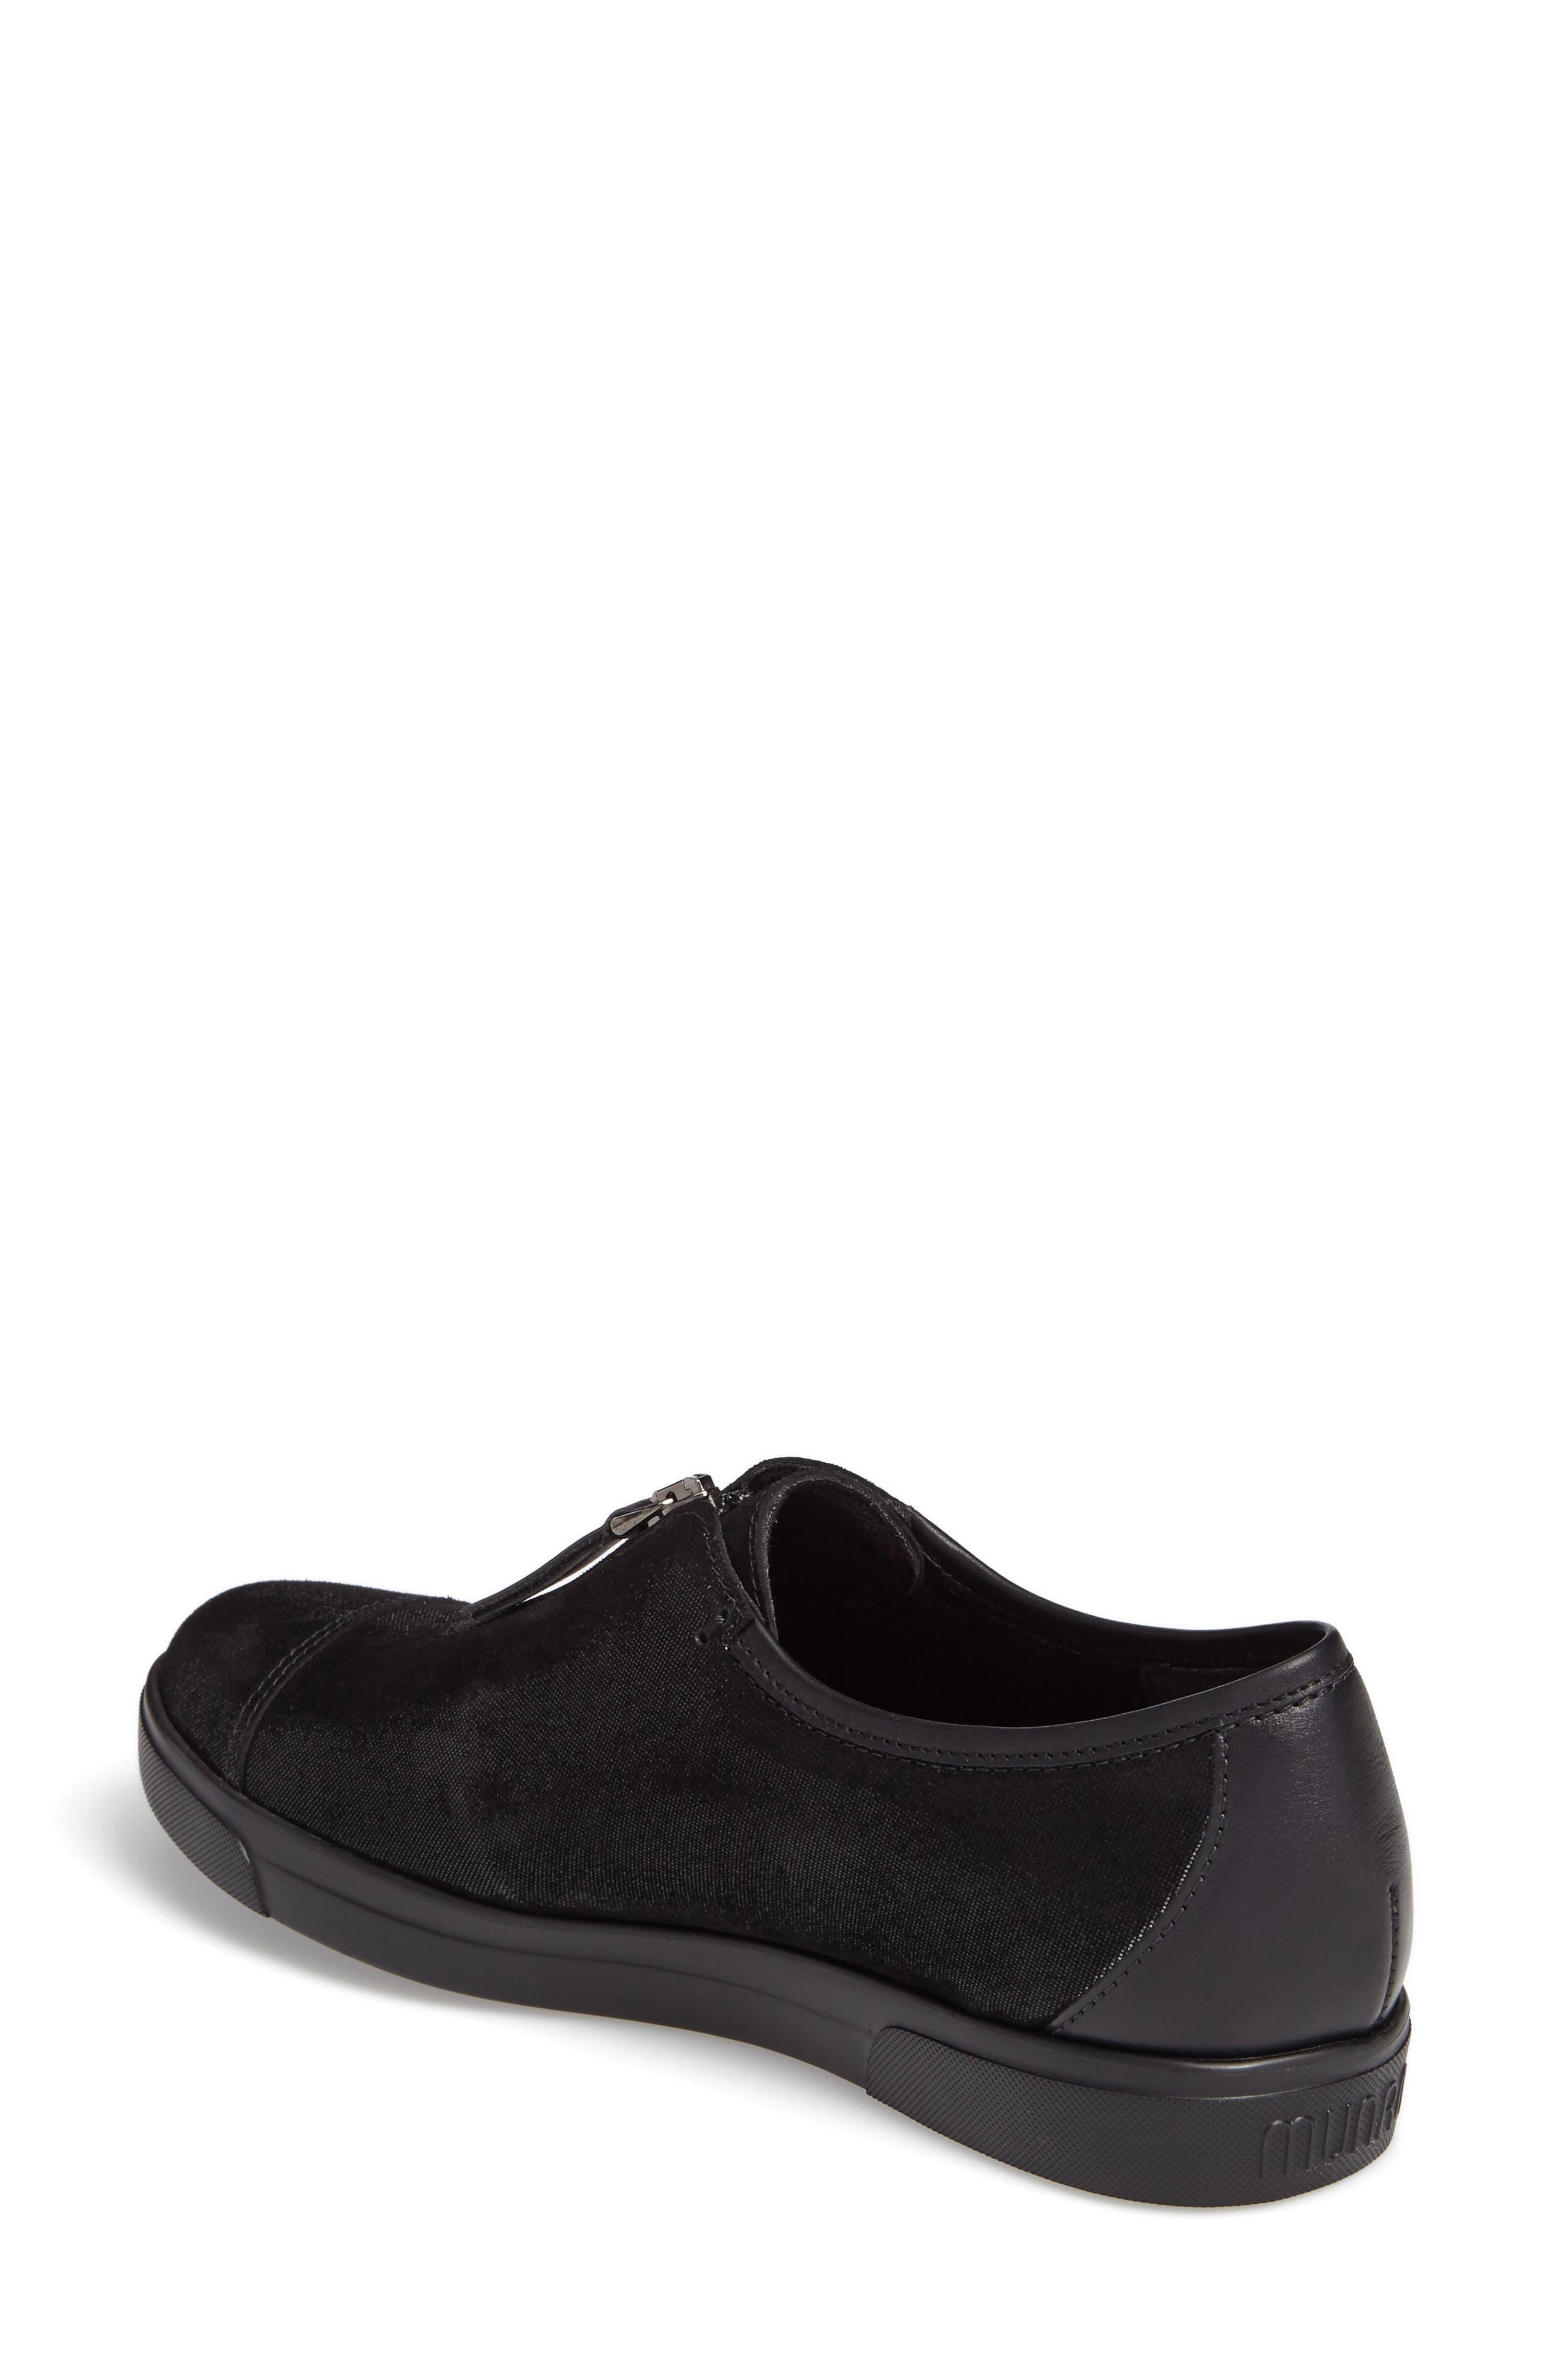 Roslyn Zip Sneaker,                             Alternate thumbnail 2, color,                             001